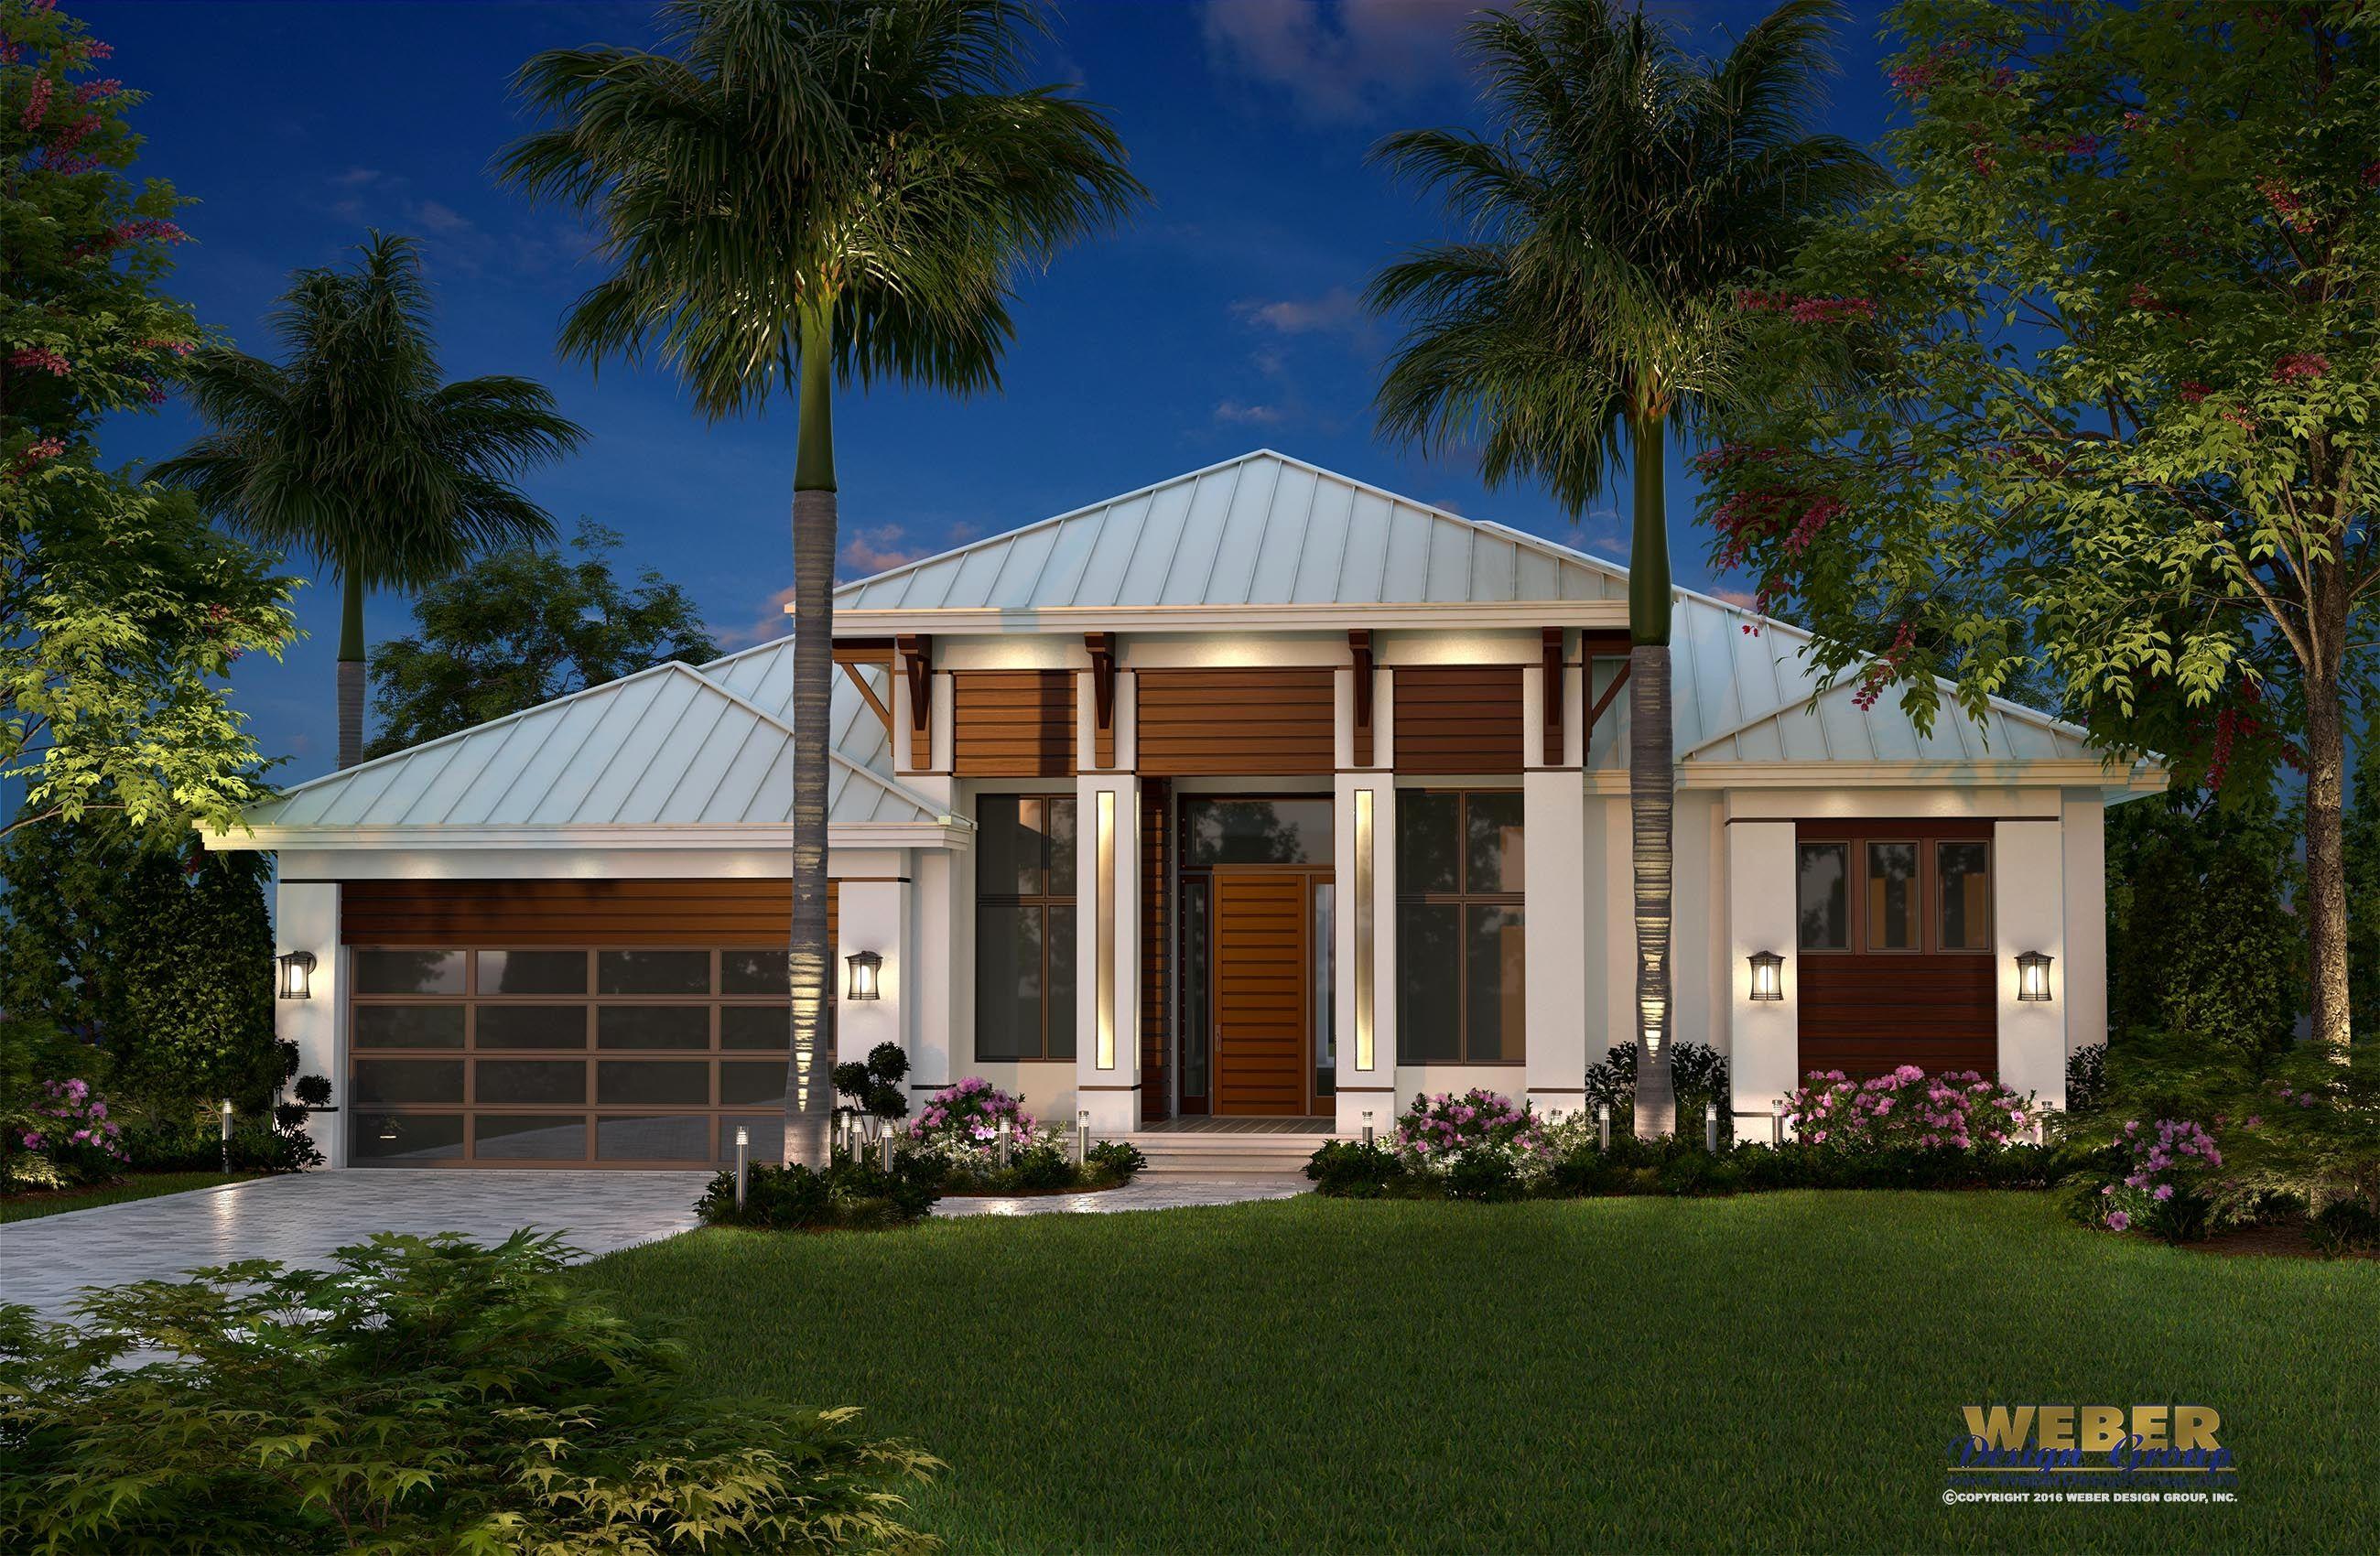 Caribbean Homes Designs Inspirational Open Plan Beach House Designs Beautiful Beach Ho Florida House Plans Mediterranean Style House Plans Coastal House Plans